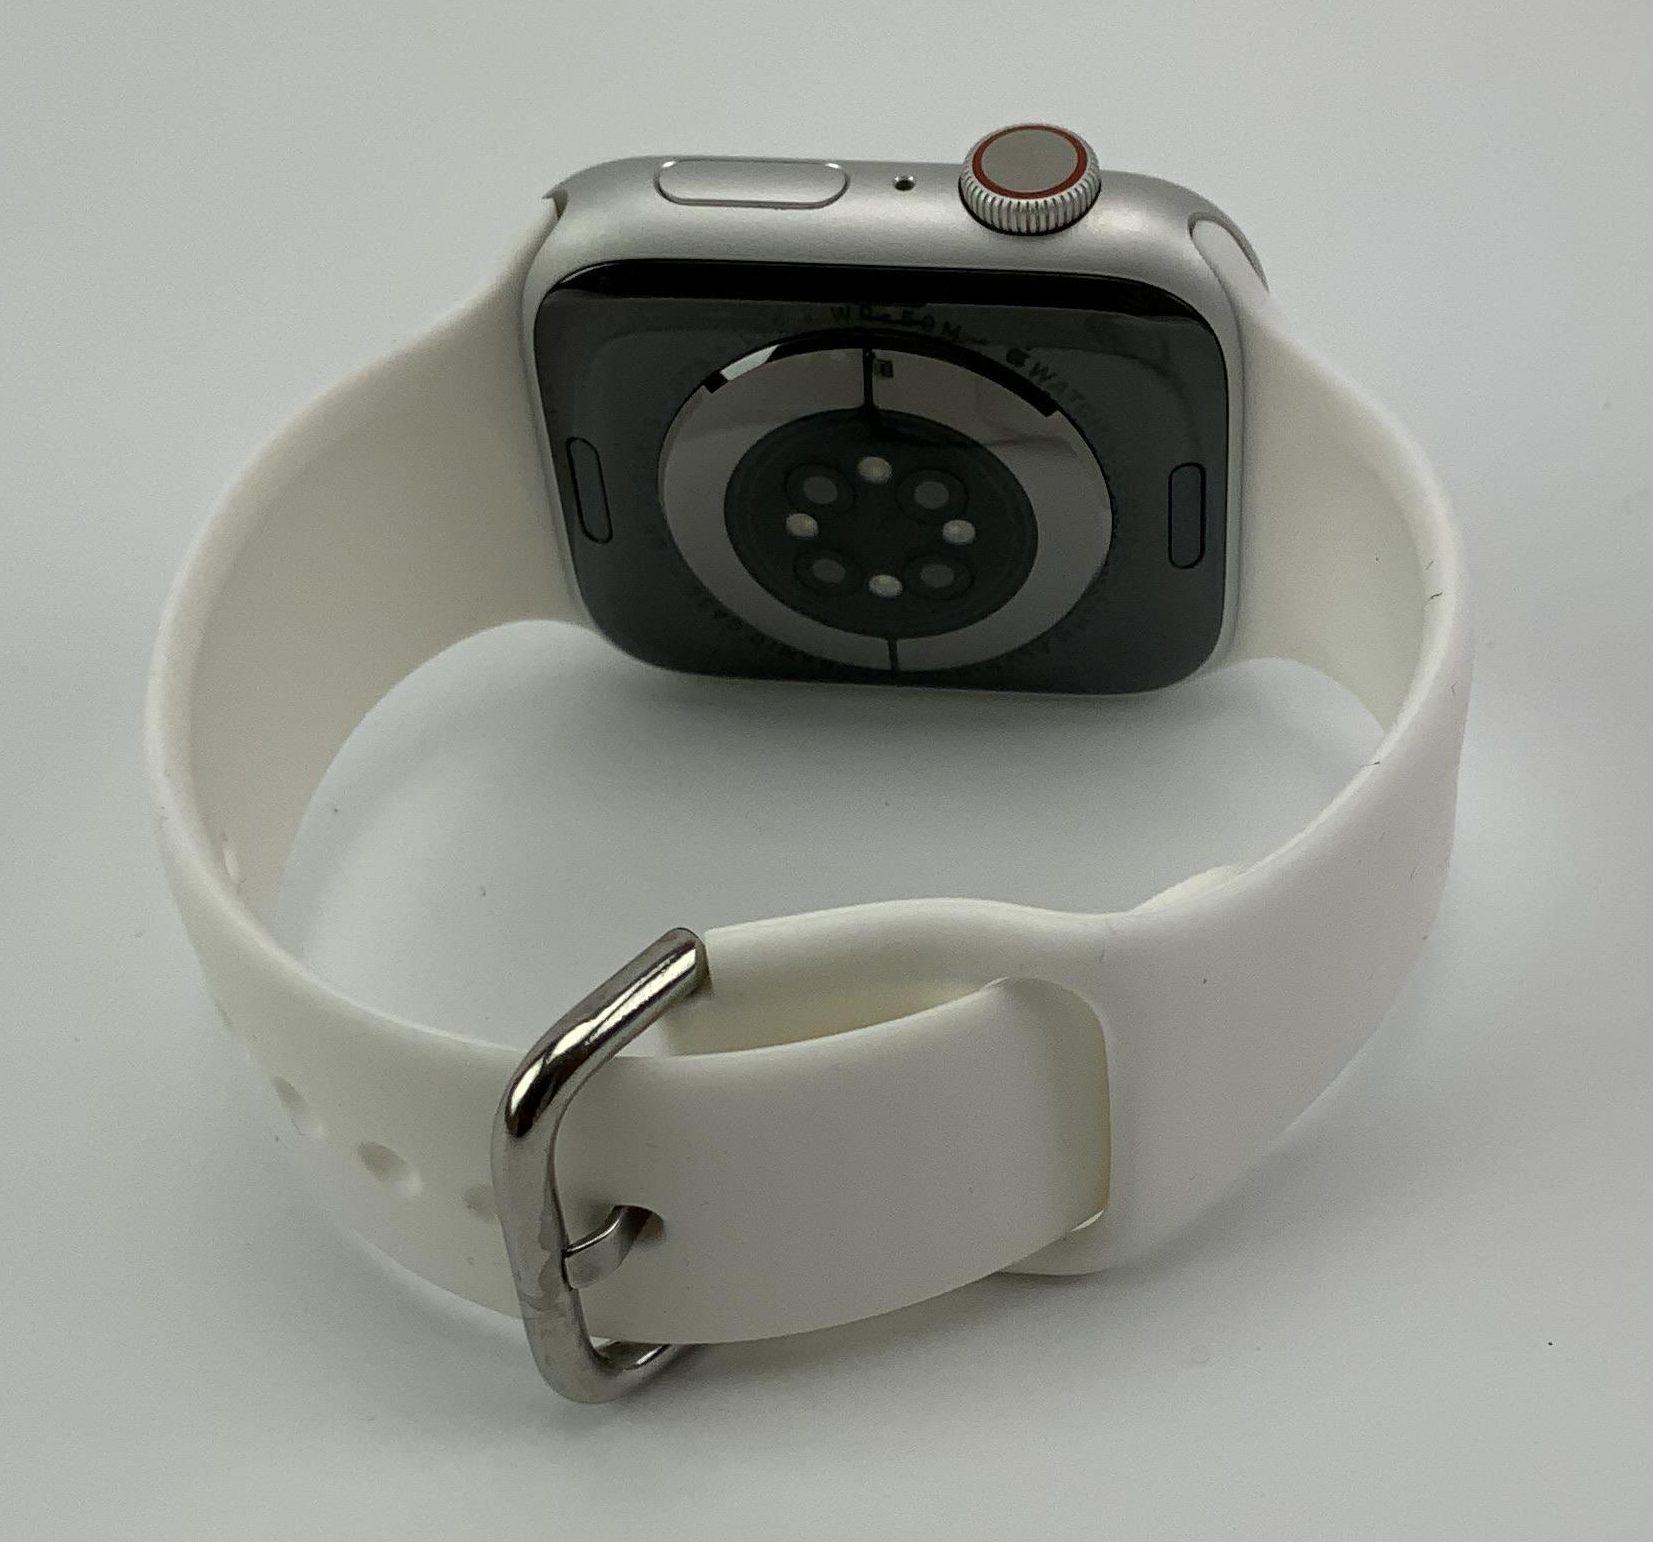 Watch Series 6 Aluminum Cellular (44mm), Silver, Afbeelding 3